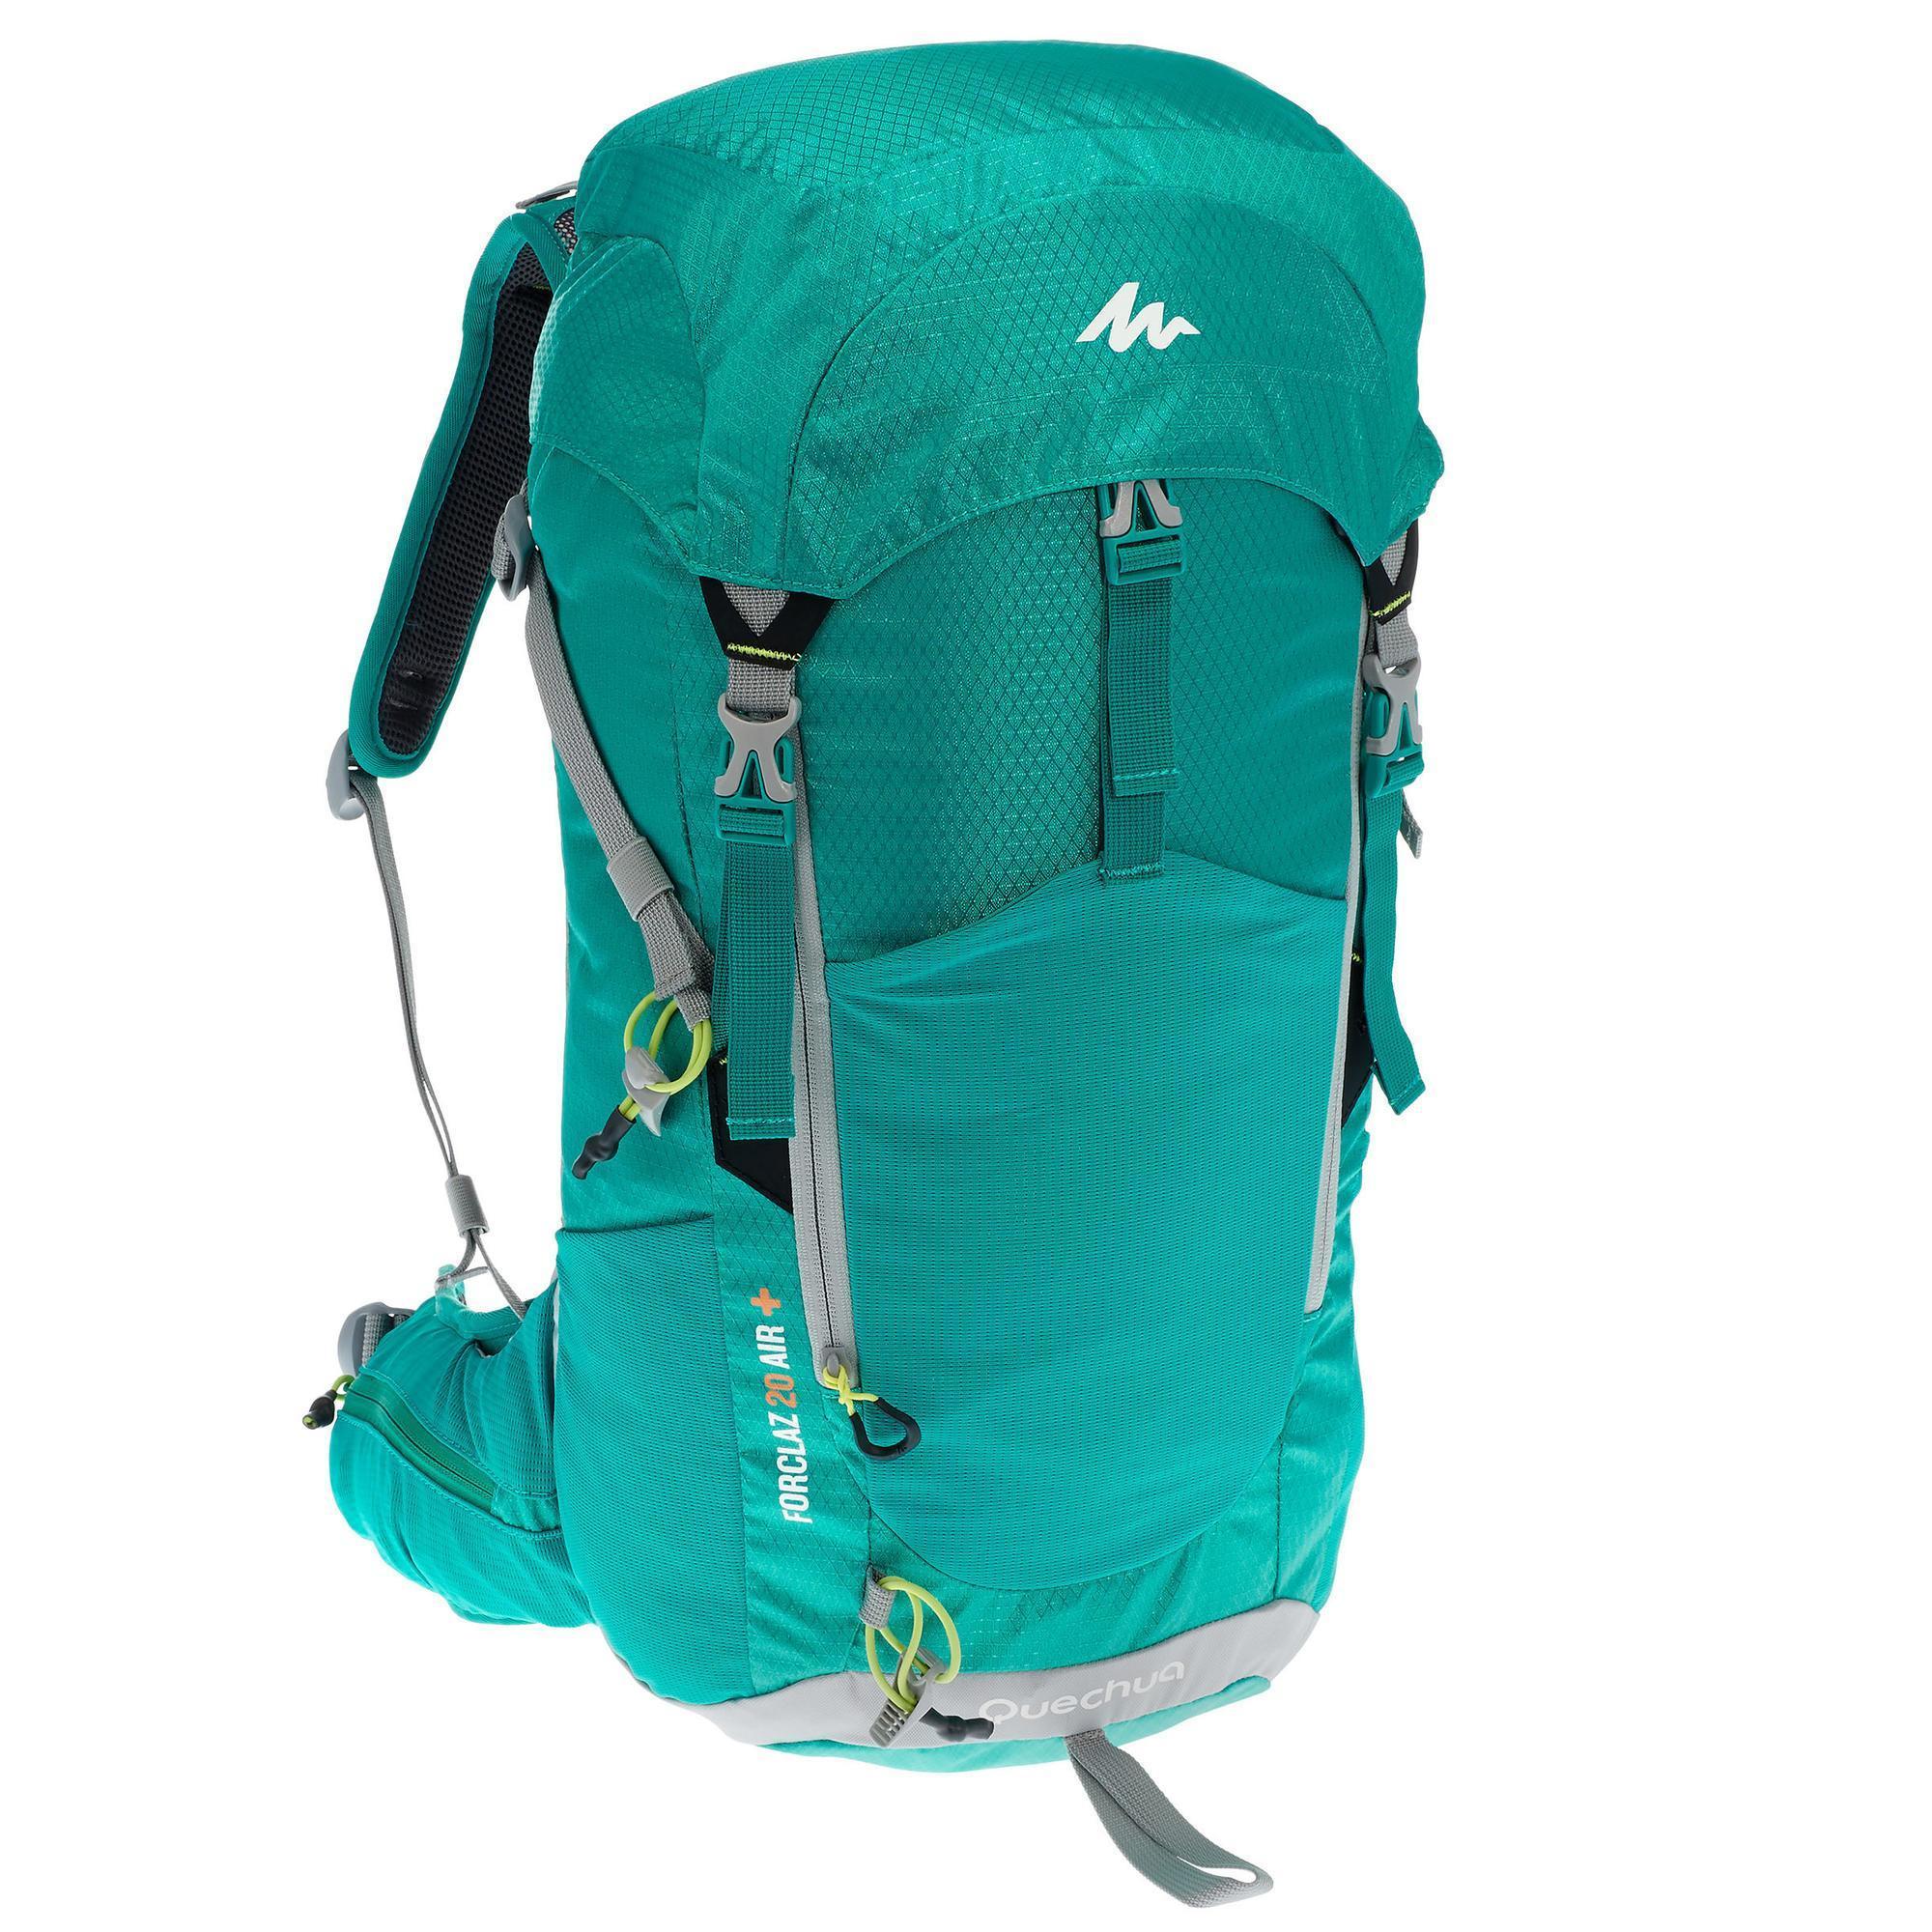 b95db4466cf1 Quechua Hiking Backpacks